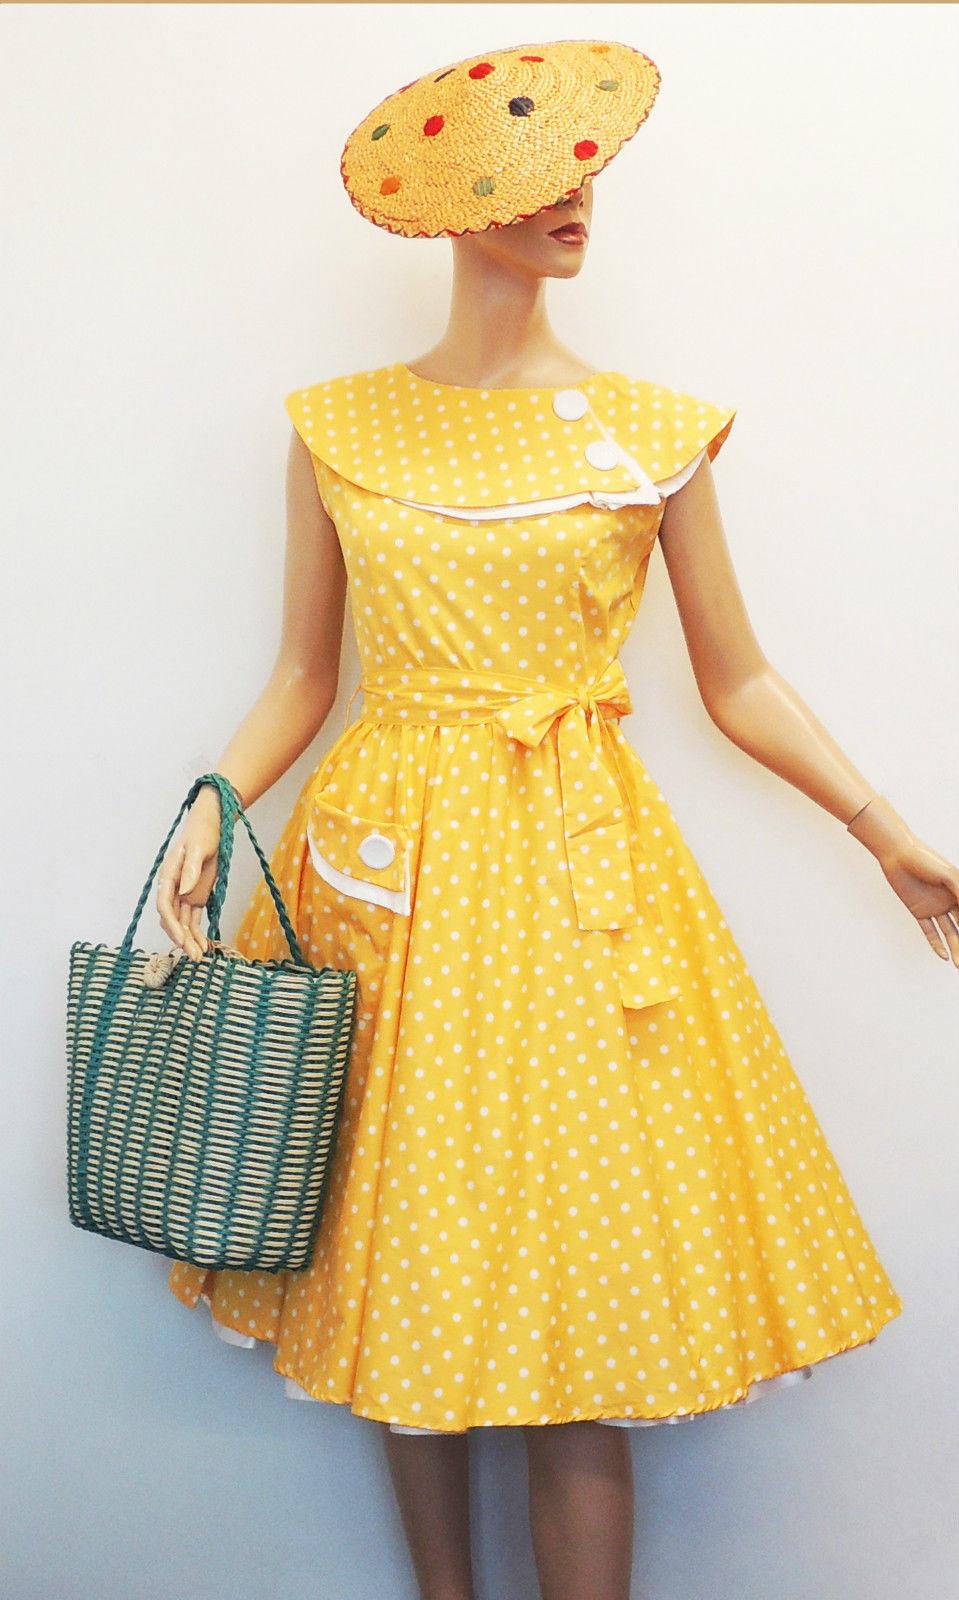 New Retro Vtg 1940's 50's style Plastic woven Beach Picnic Shopping Basket Bag